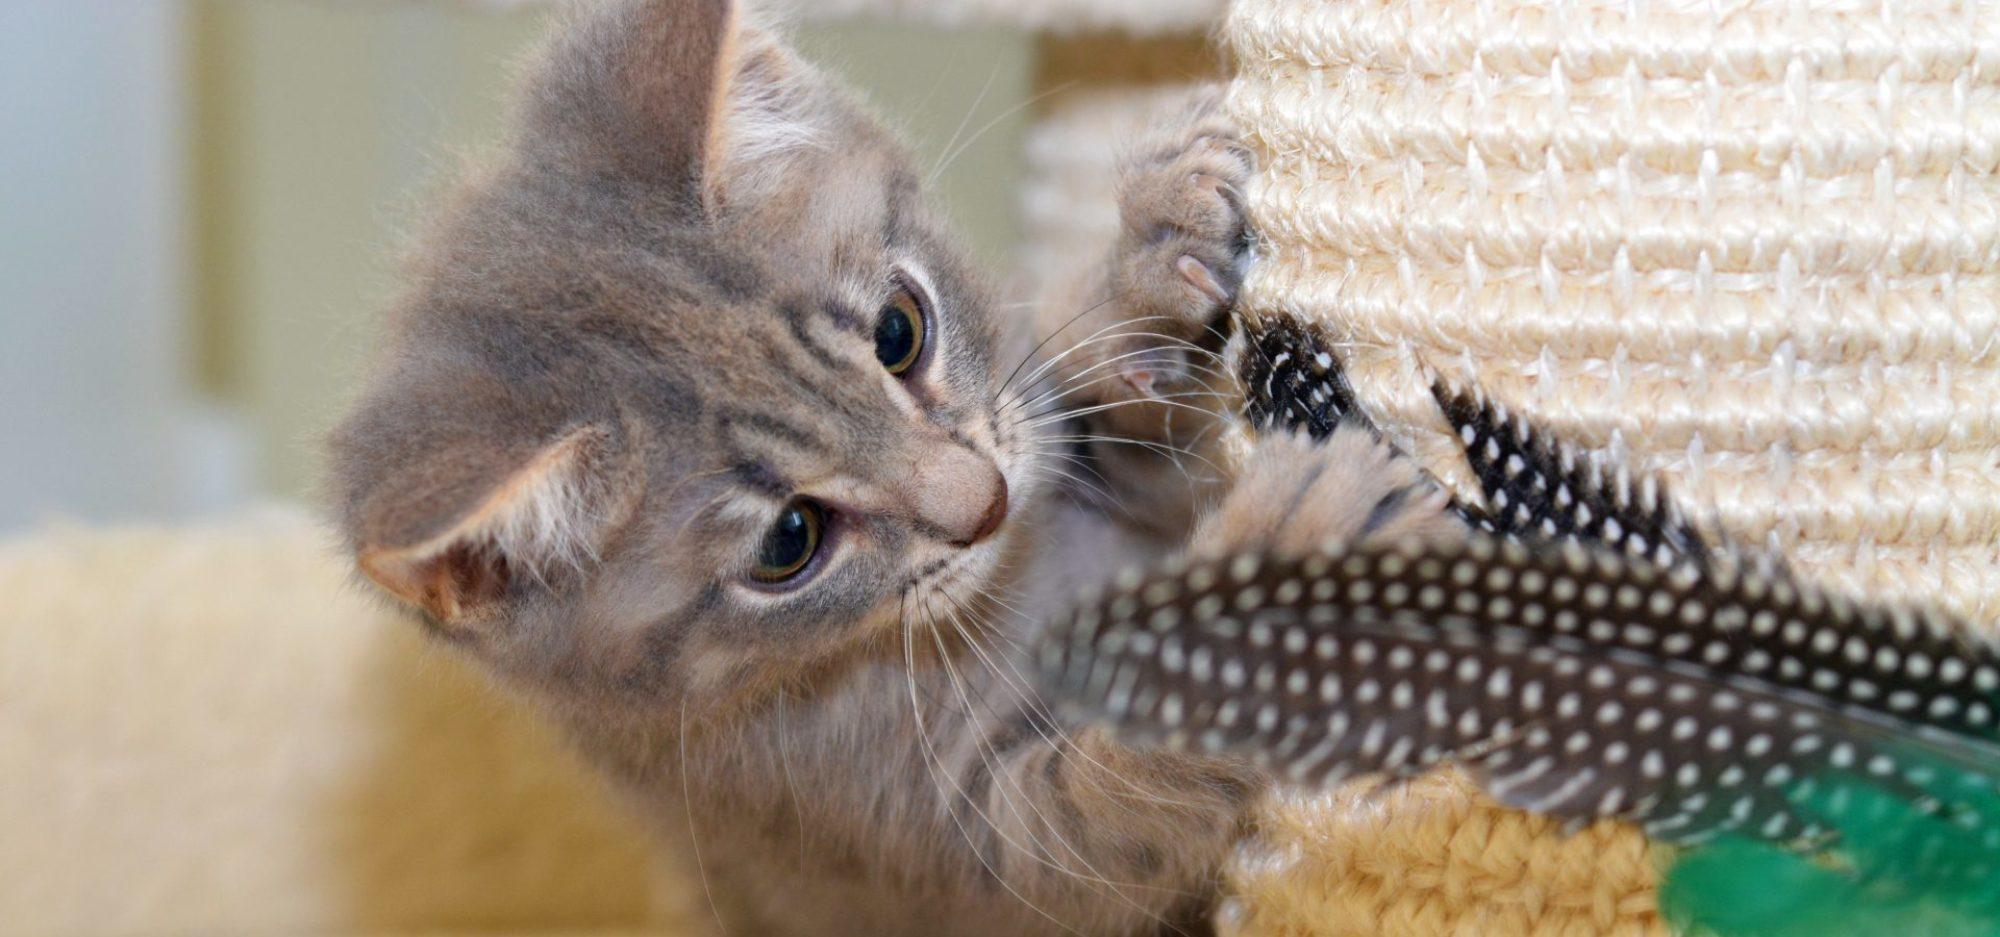 Kattstallets volontärer